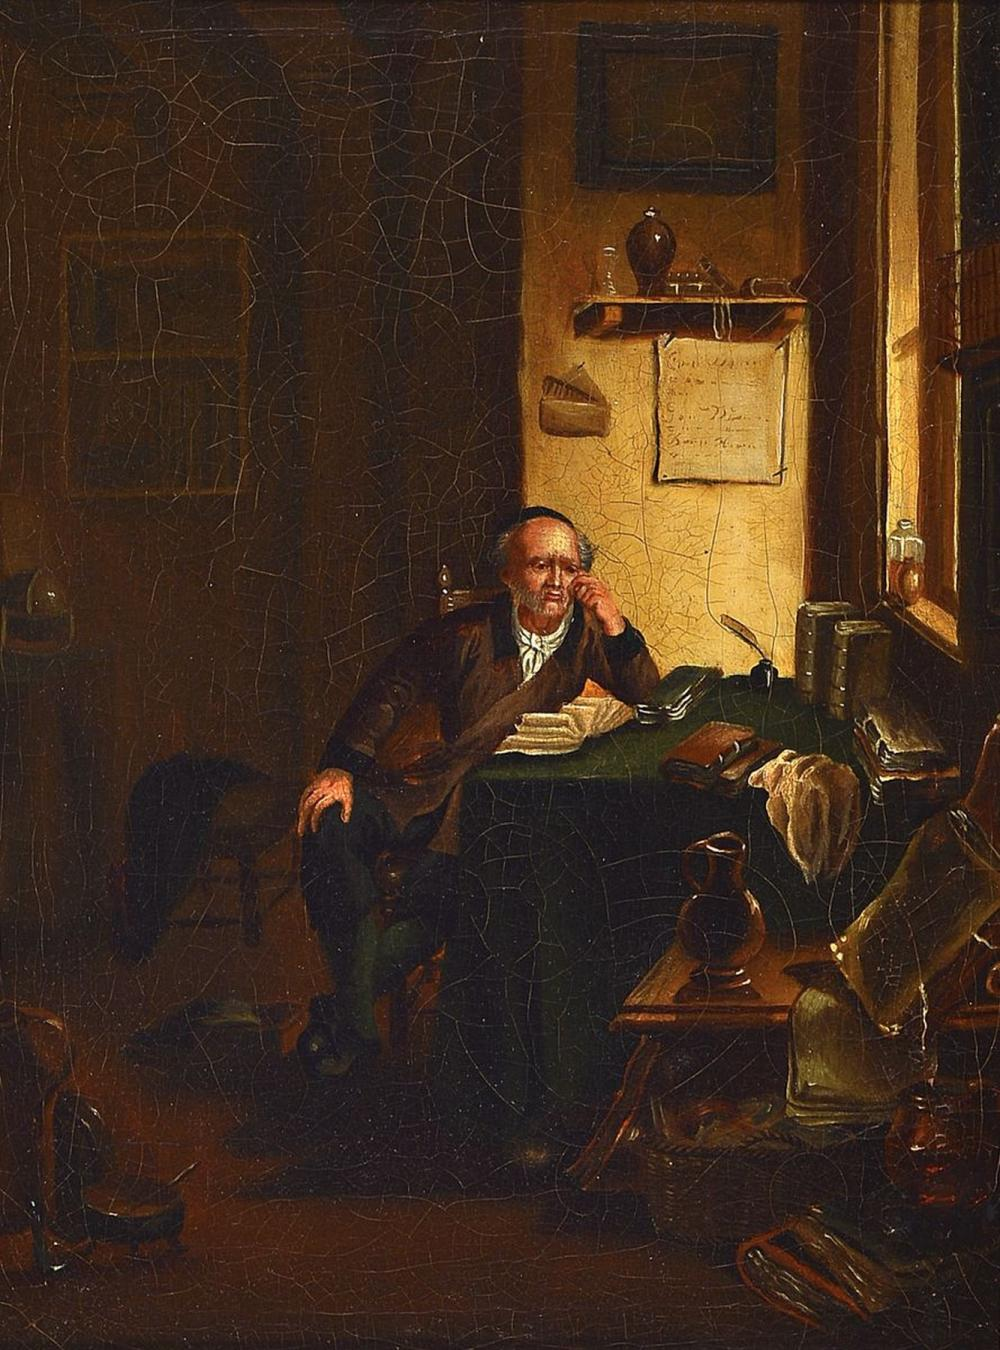 Unidentified artist, german, mid 19th century,The scholar